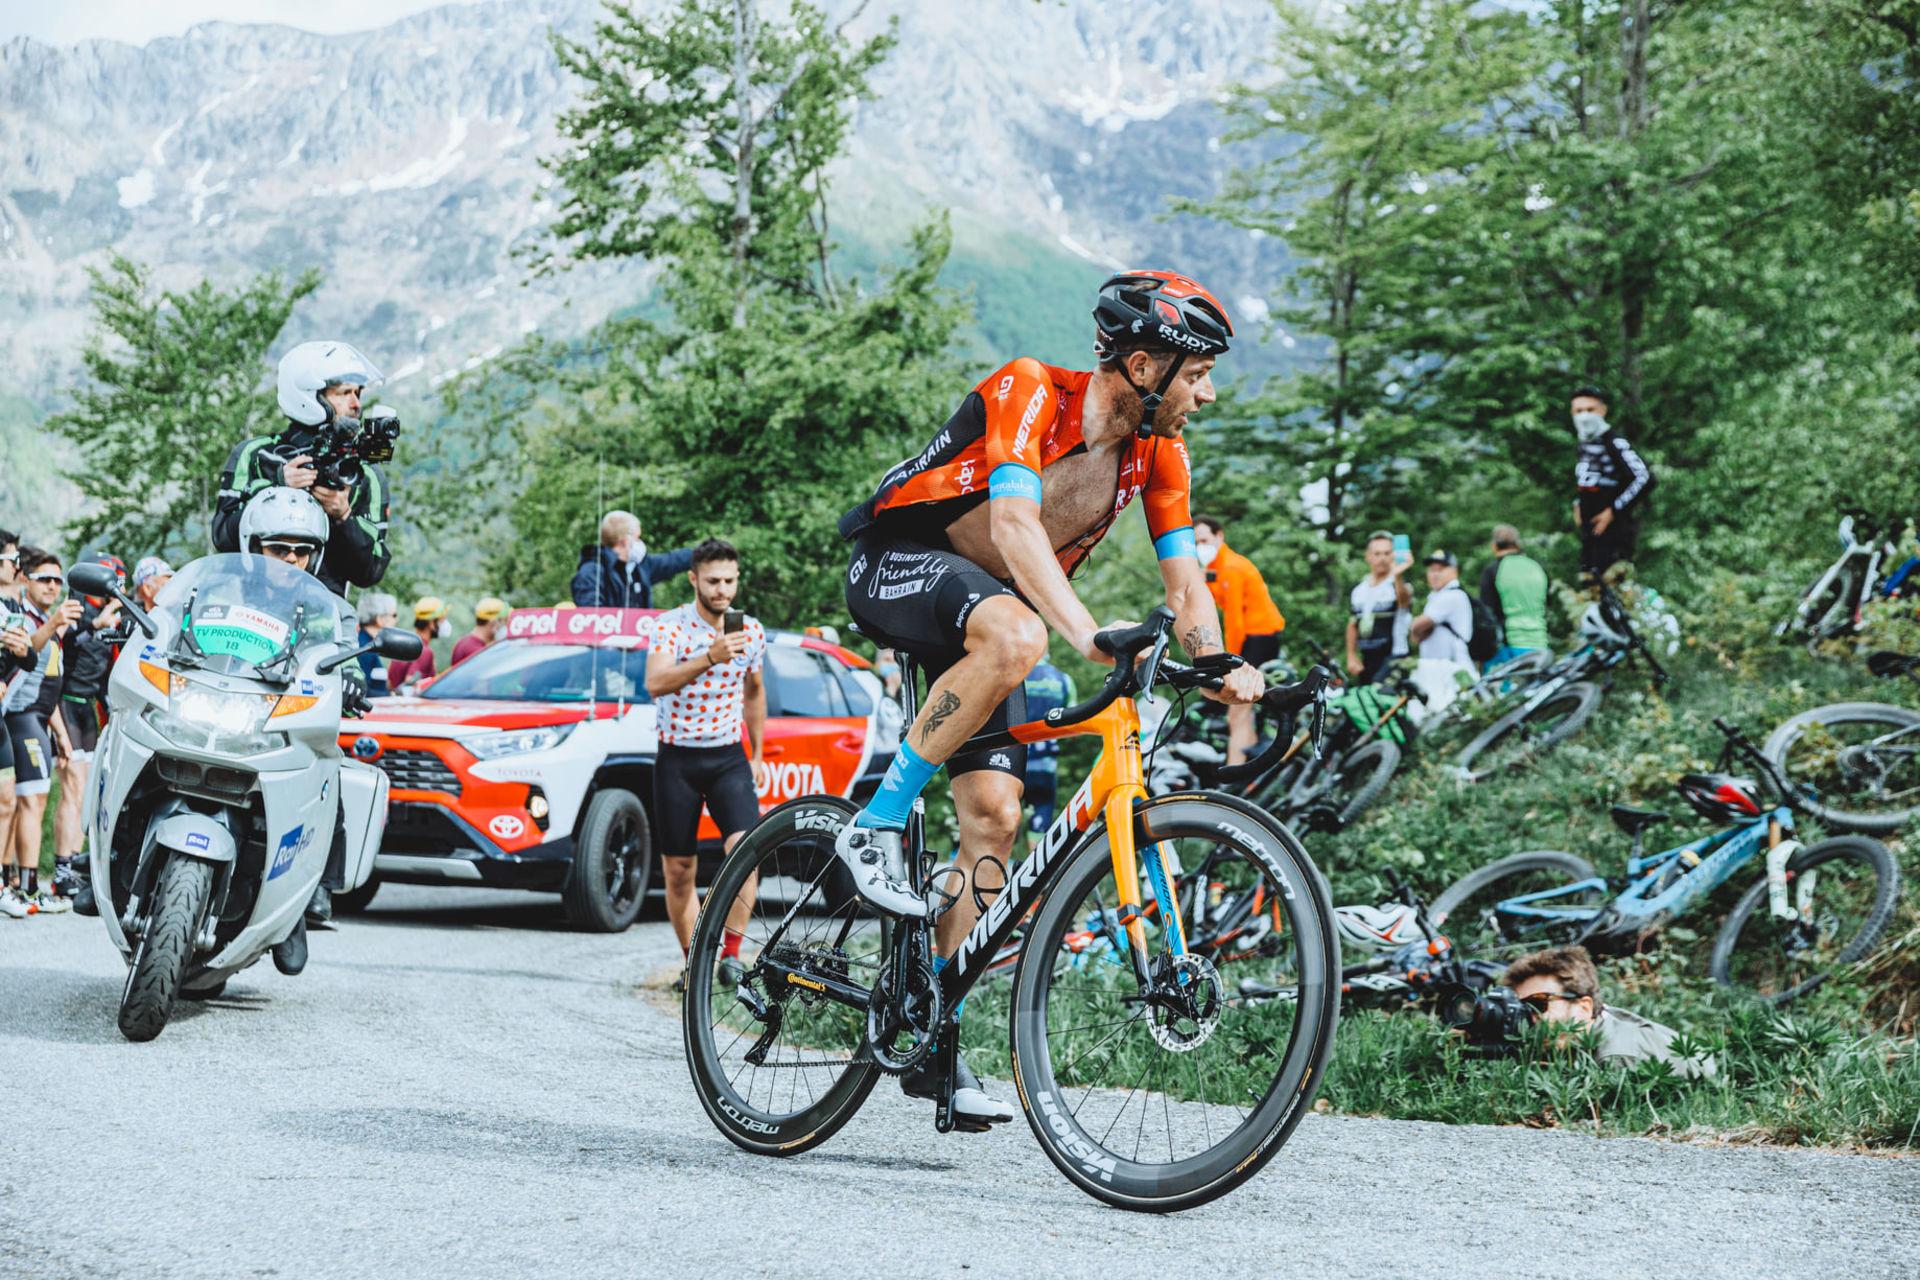 Giro d'Italia, Damiano Caruso, rowery Merida, Bahrain Victorious, Reacto, Scultura, rowery szosowe